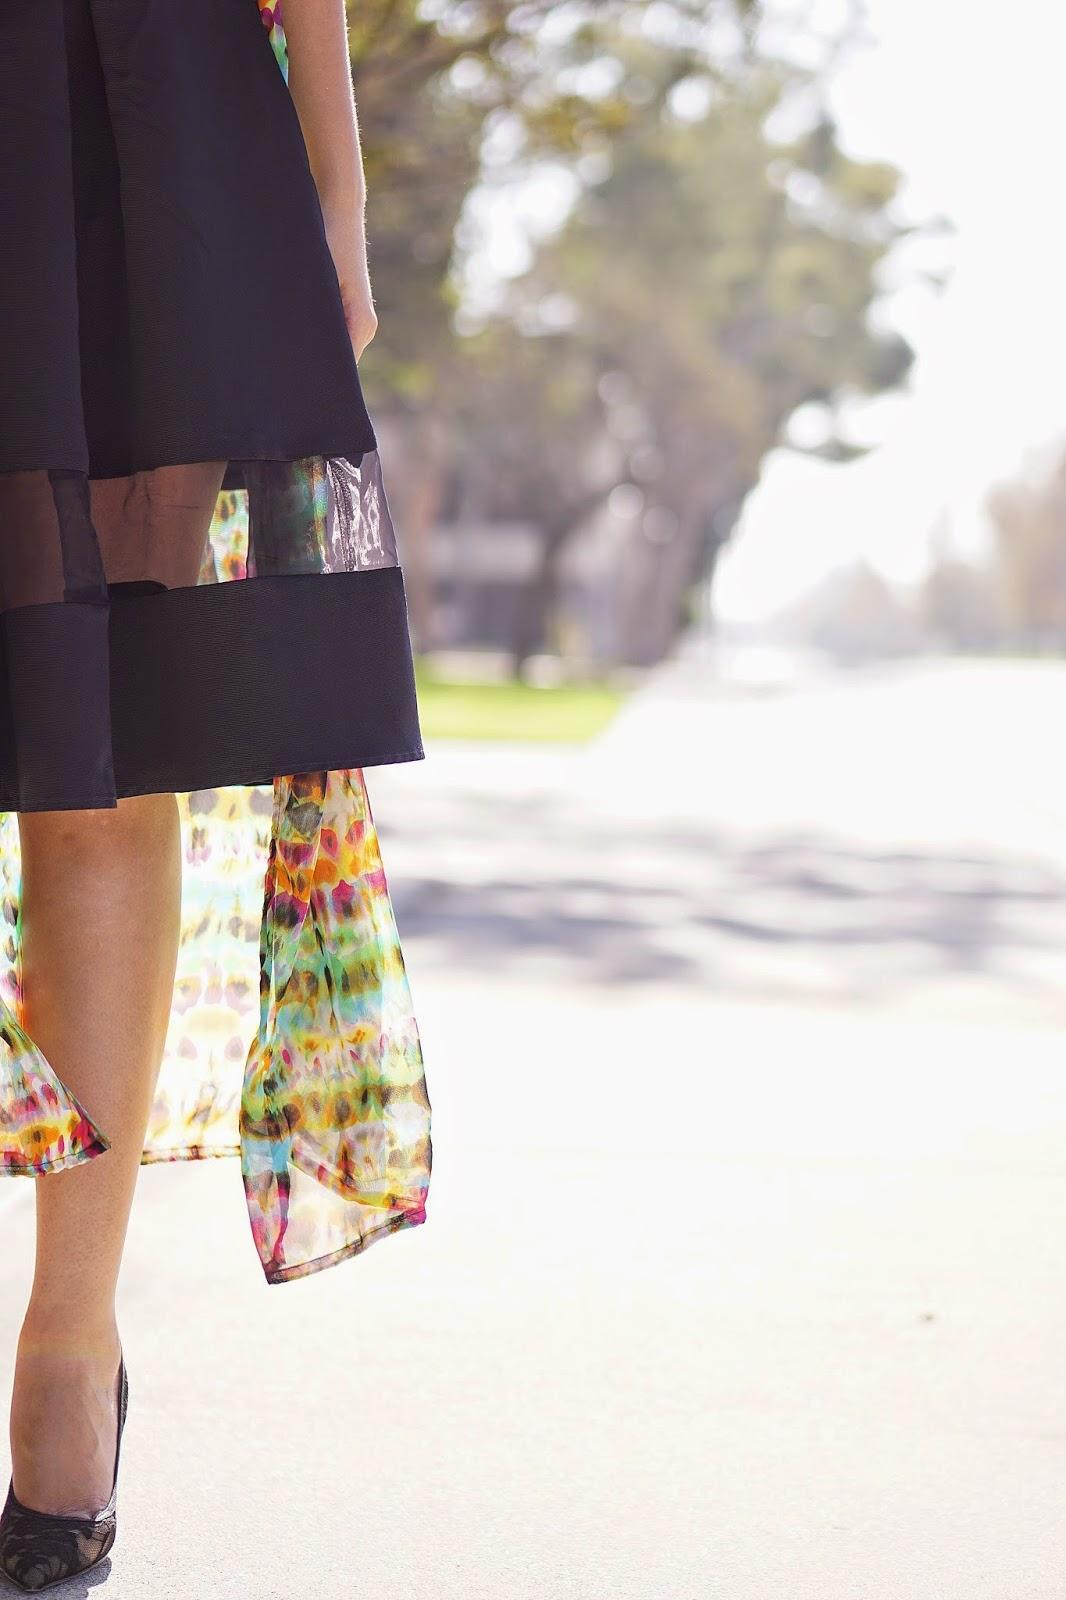 Lookbook, Latina Fashion Blogger, LA Fashion Blogger, Lookbook Store Review, Lookbook Store Maxi Cardigan, Multicolored Maxi Cardigan, Black Express Dress, Black Dress, Lace Heels, Shoemint Heels, Spring Inspiration,